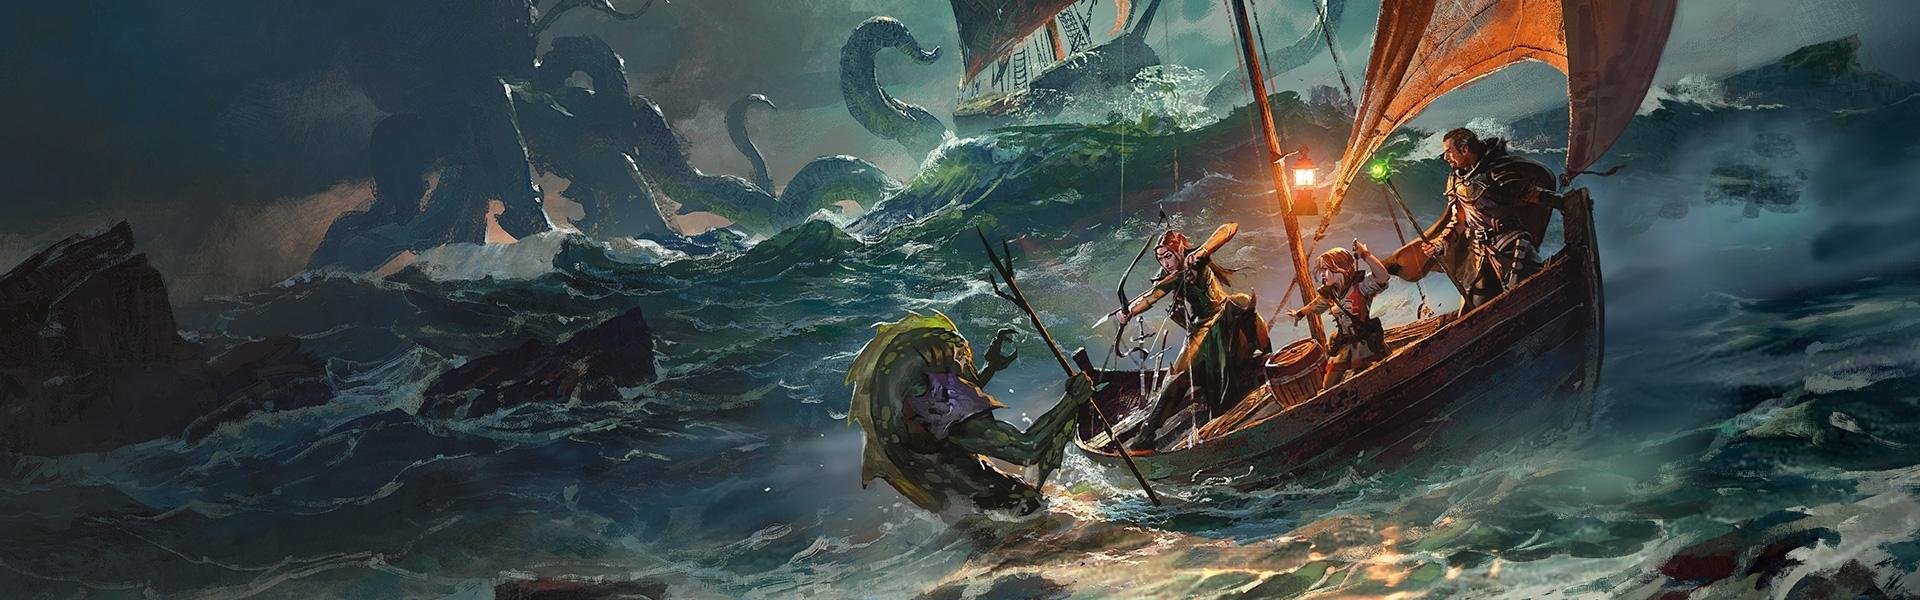 Dungeons & Dragons - Adventure Ghosts of Saltmarsh